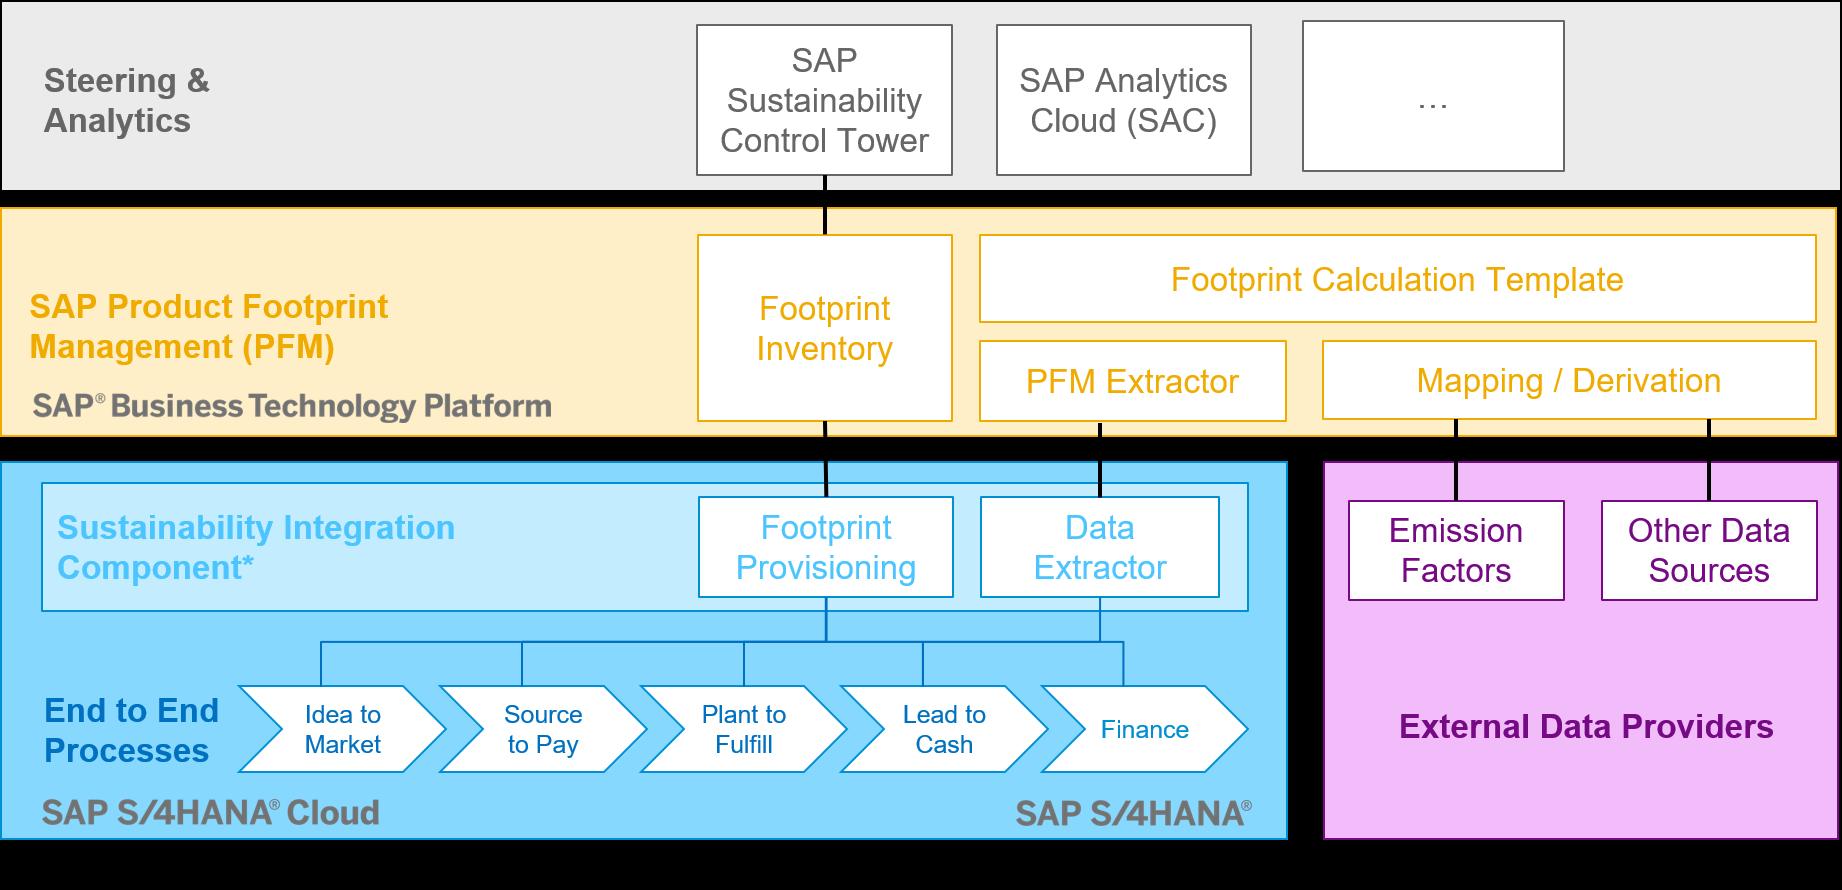 SAP%20Product%20Footprint%20Management%20-%20Business%20Architecture